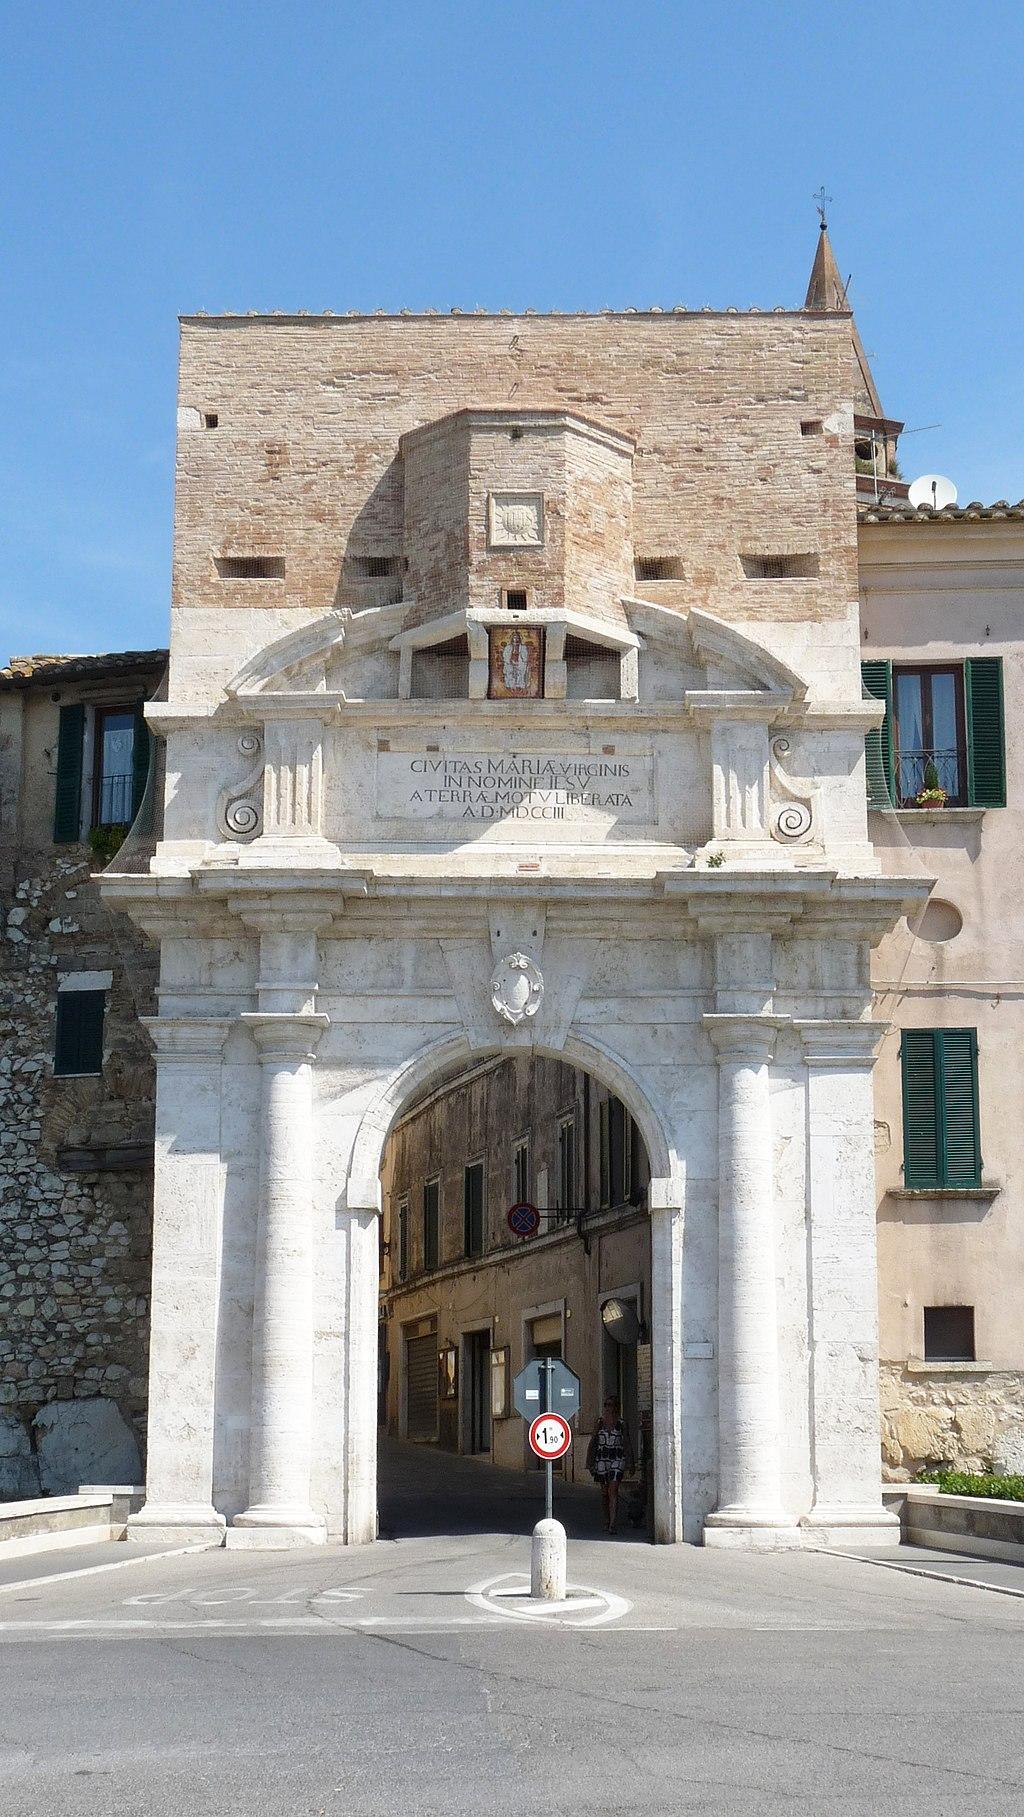 Porta Romana - Amelia | www.umbriatourism.it